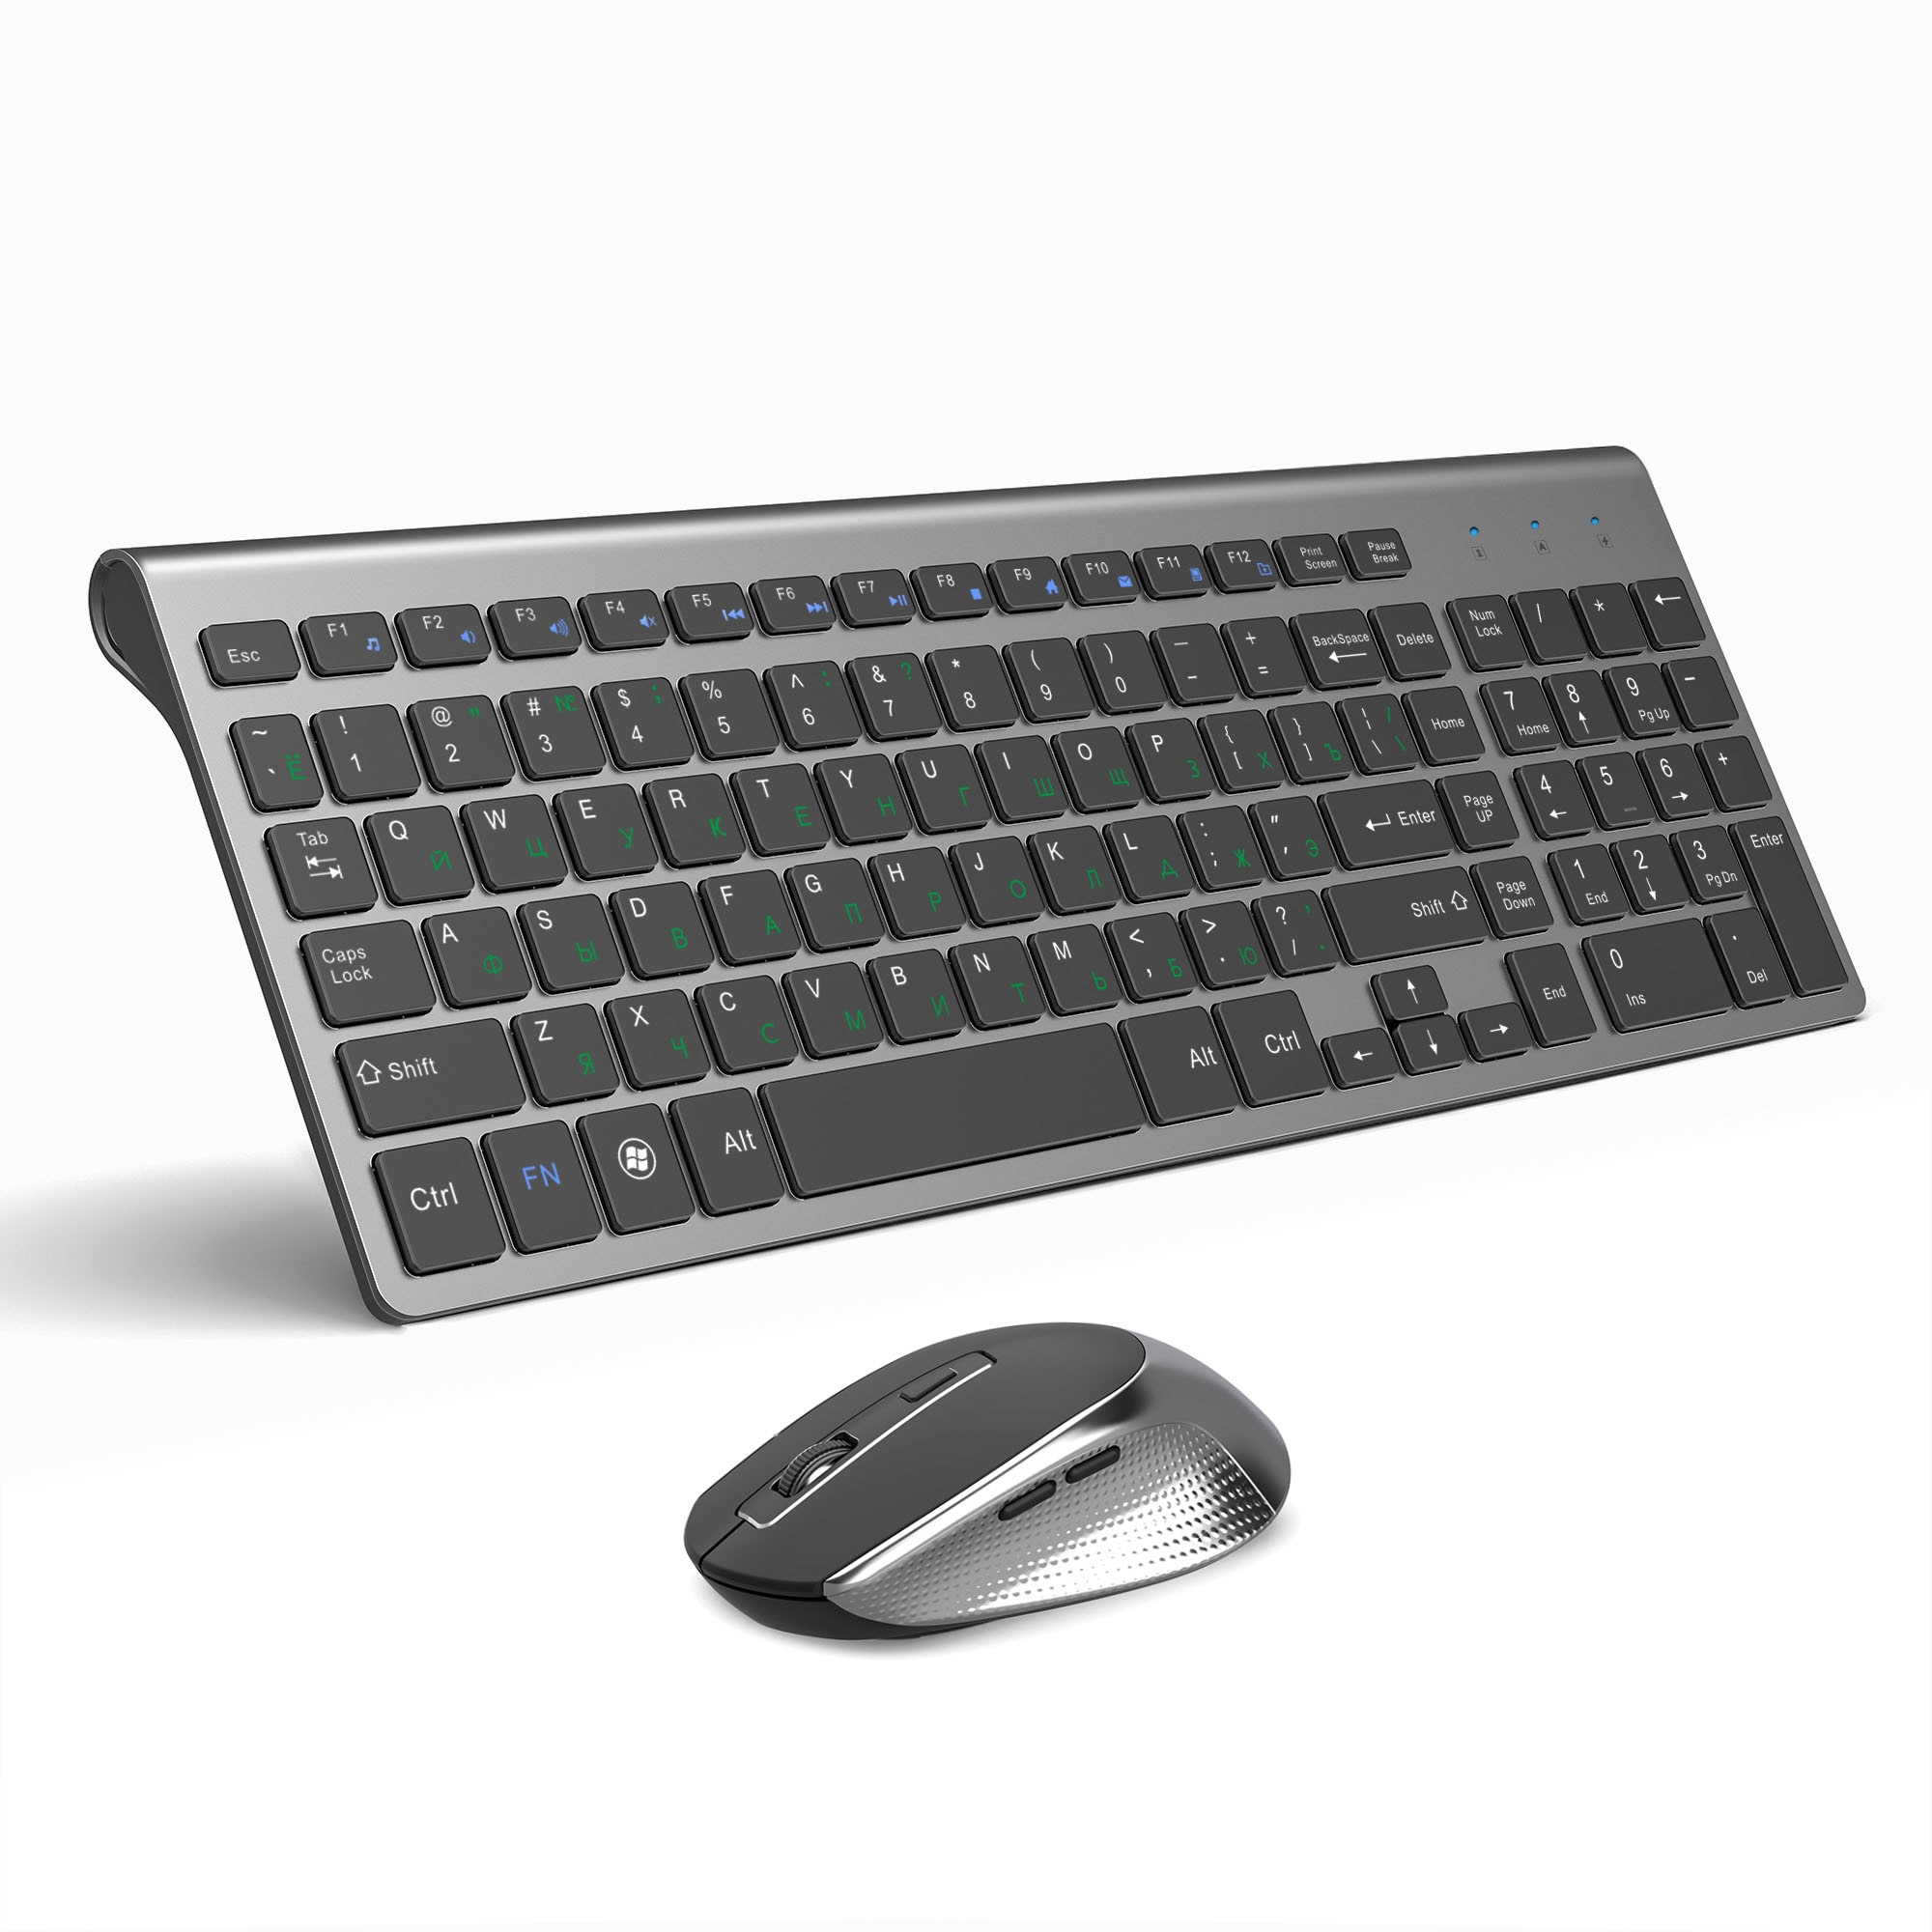 JOYACCESS الروسية اللاسلكية لوحة المفاتيح الماوس مجموعة فأرة مريحة الكمبيوتر Mause الصامت زر لوحة مفاتيح وماوس كومبو 2.4G لأجهزة الكمبيوتر المحمول